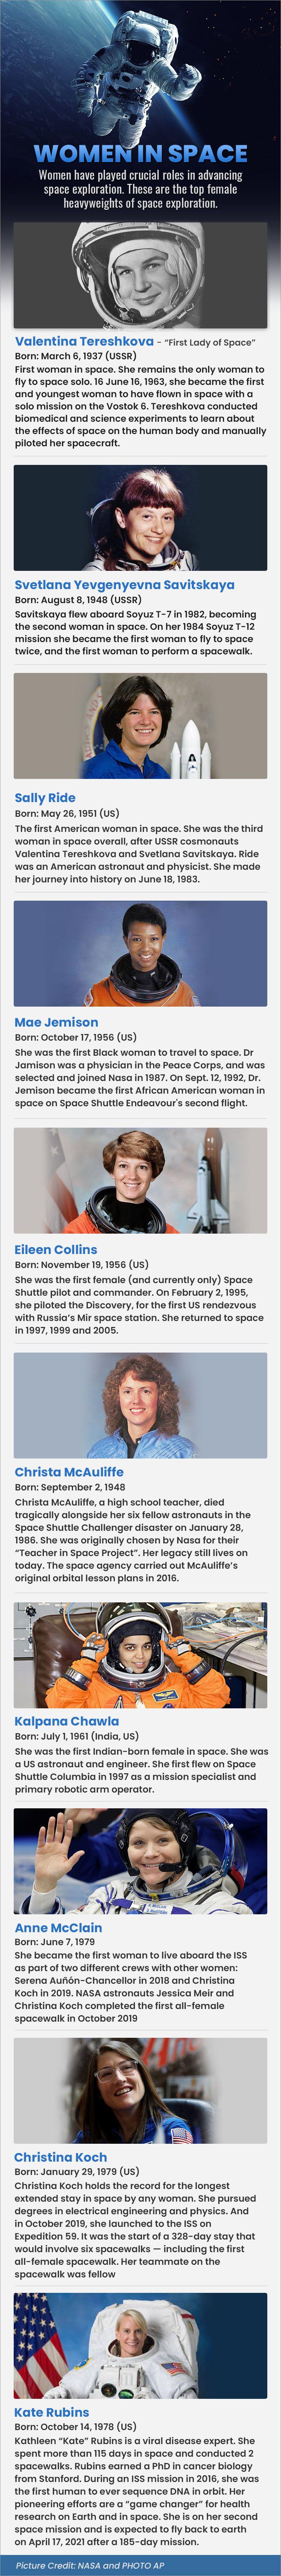 Space girls women in space